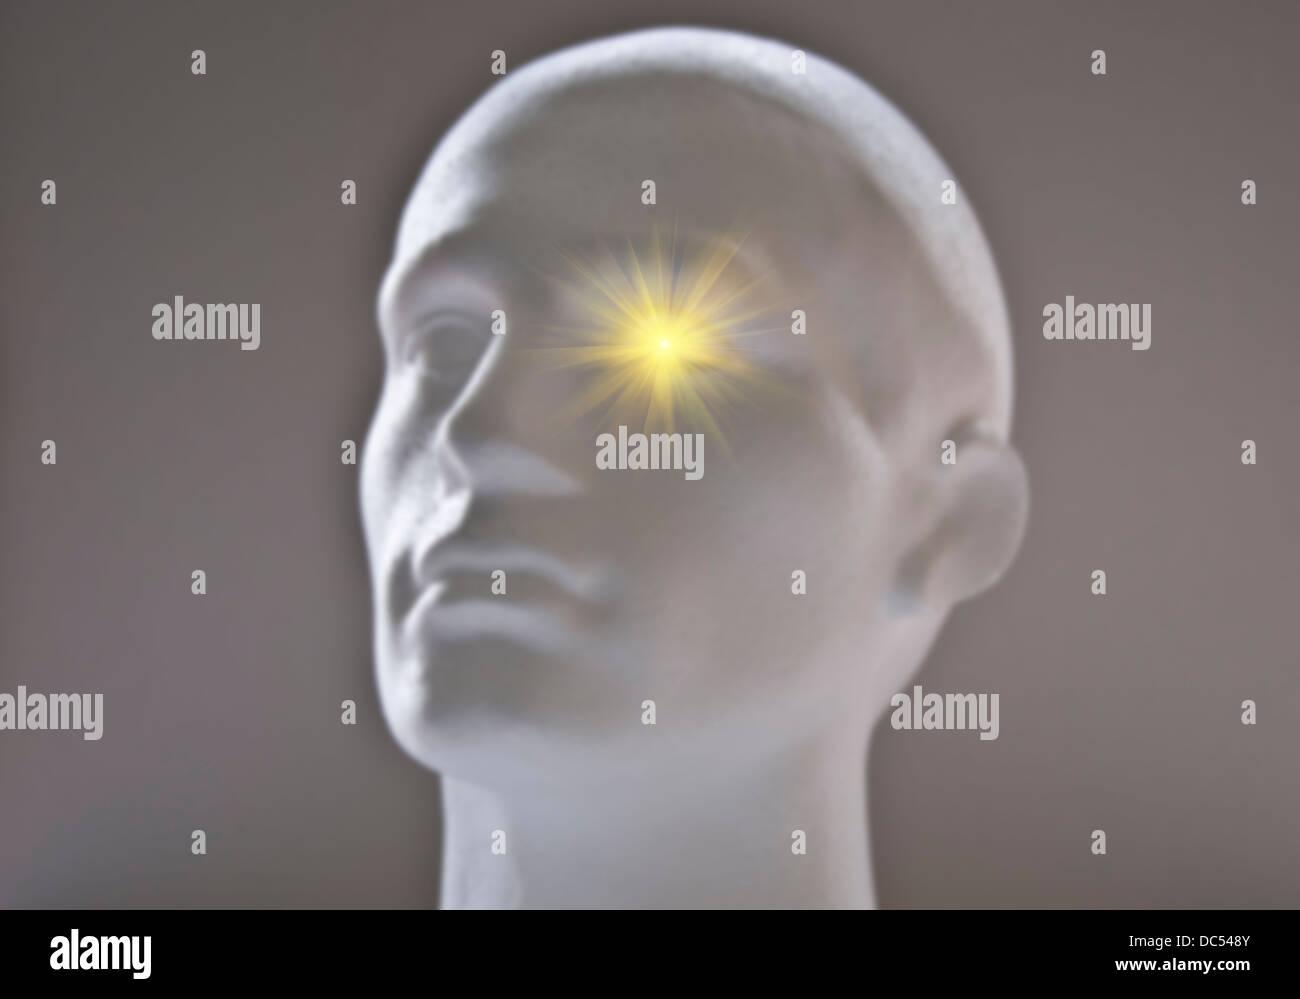 Bright Ideas Stockbild